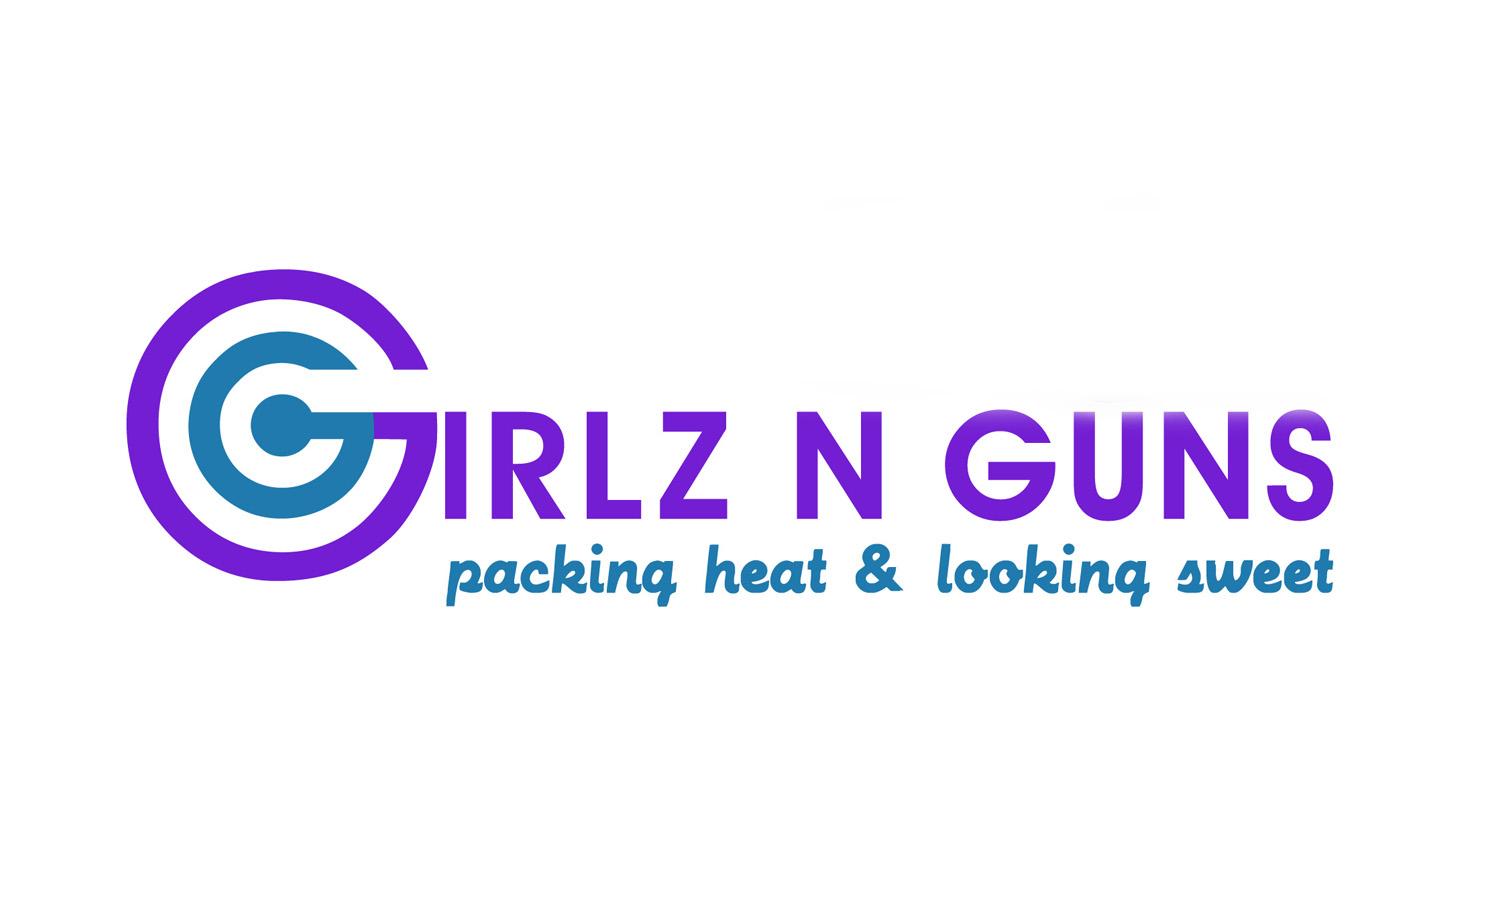 www.girlznguns.com